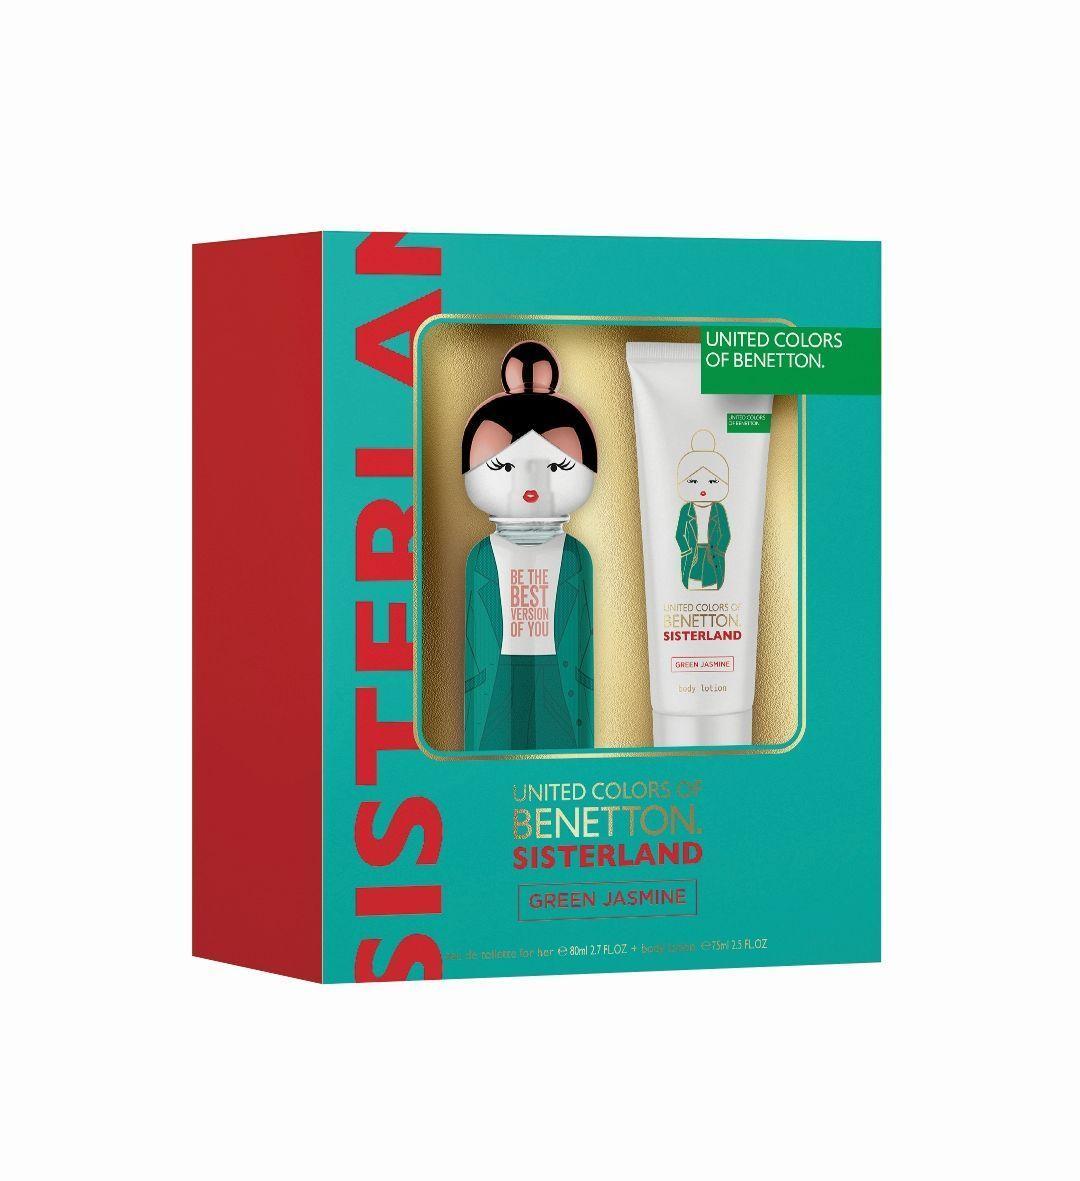 Benetton Sisterland Colonia Green Jasmine Set 80ml Vaporizador + Body Milk 75ml